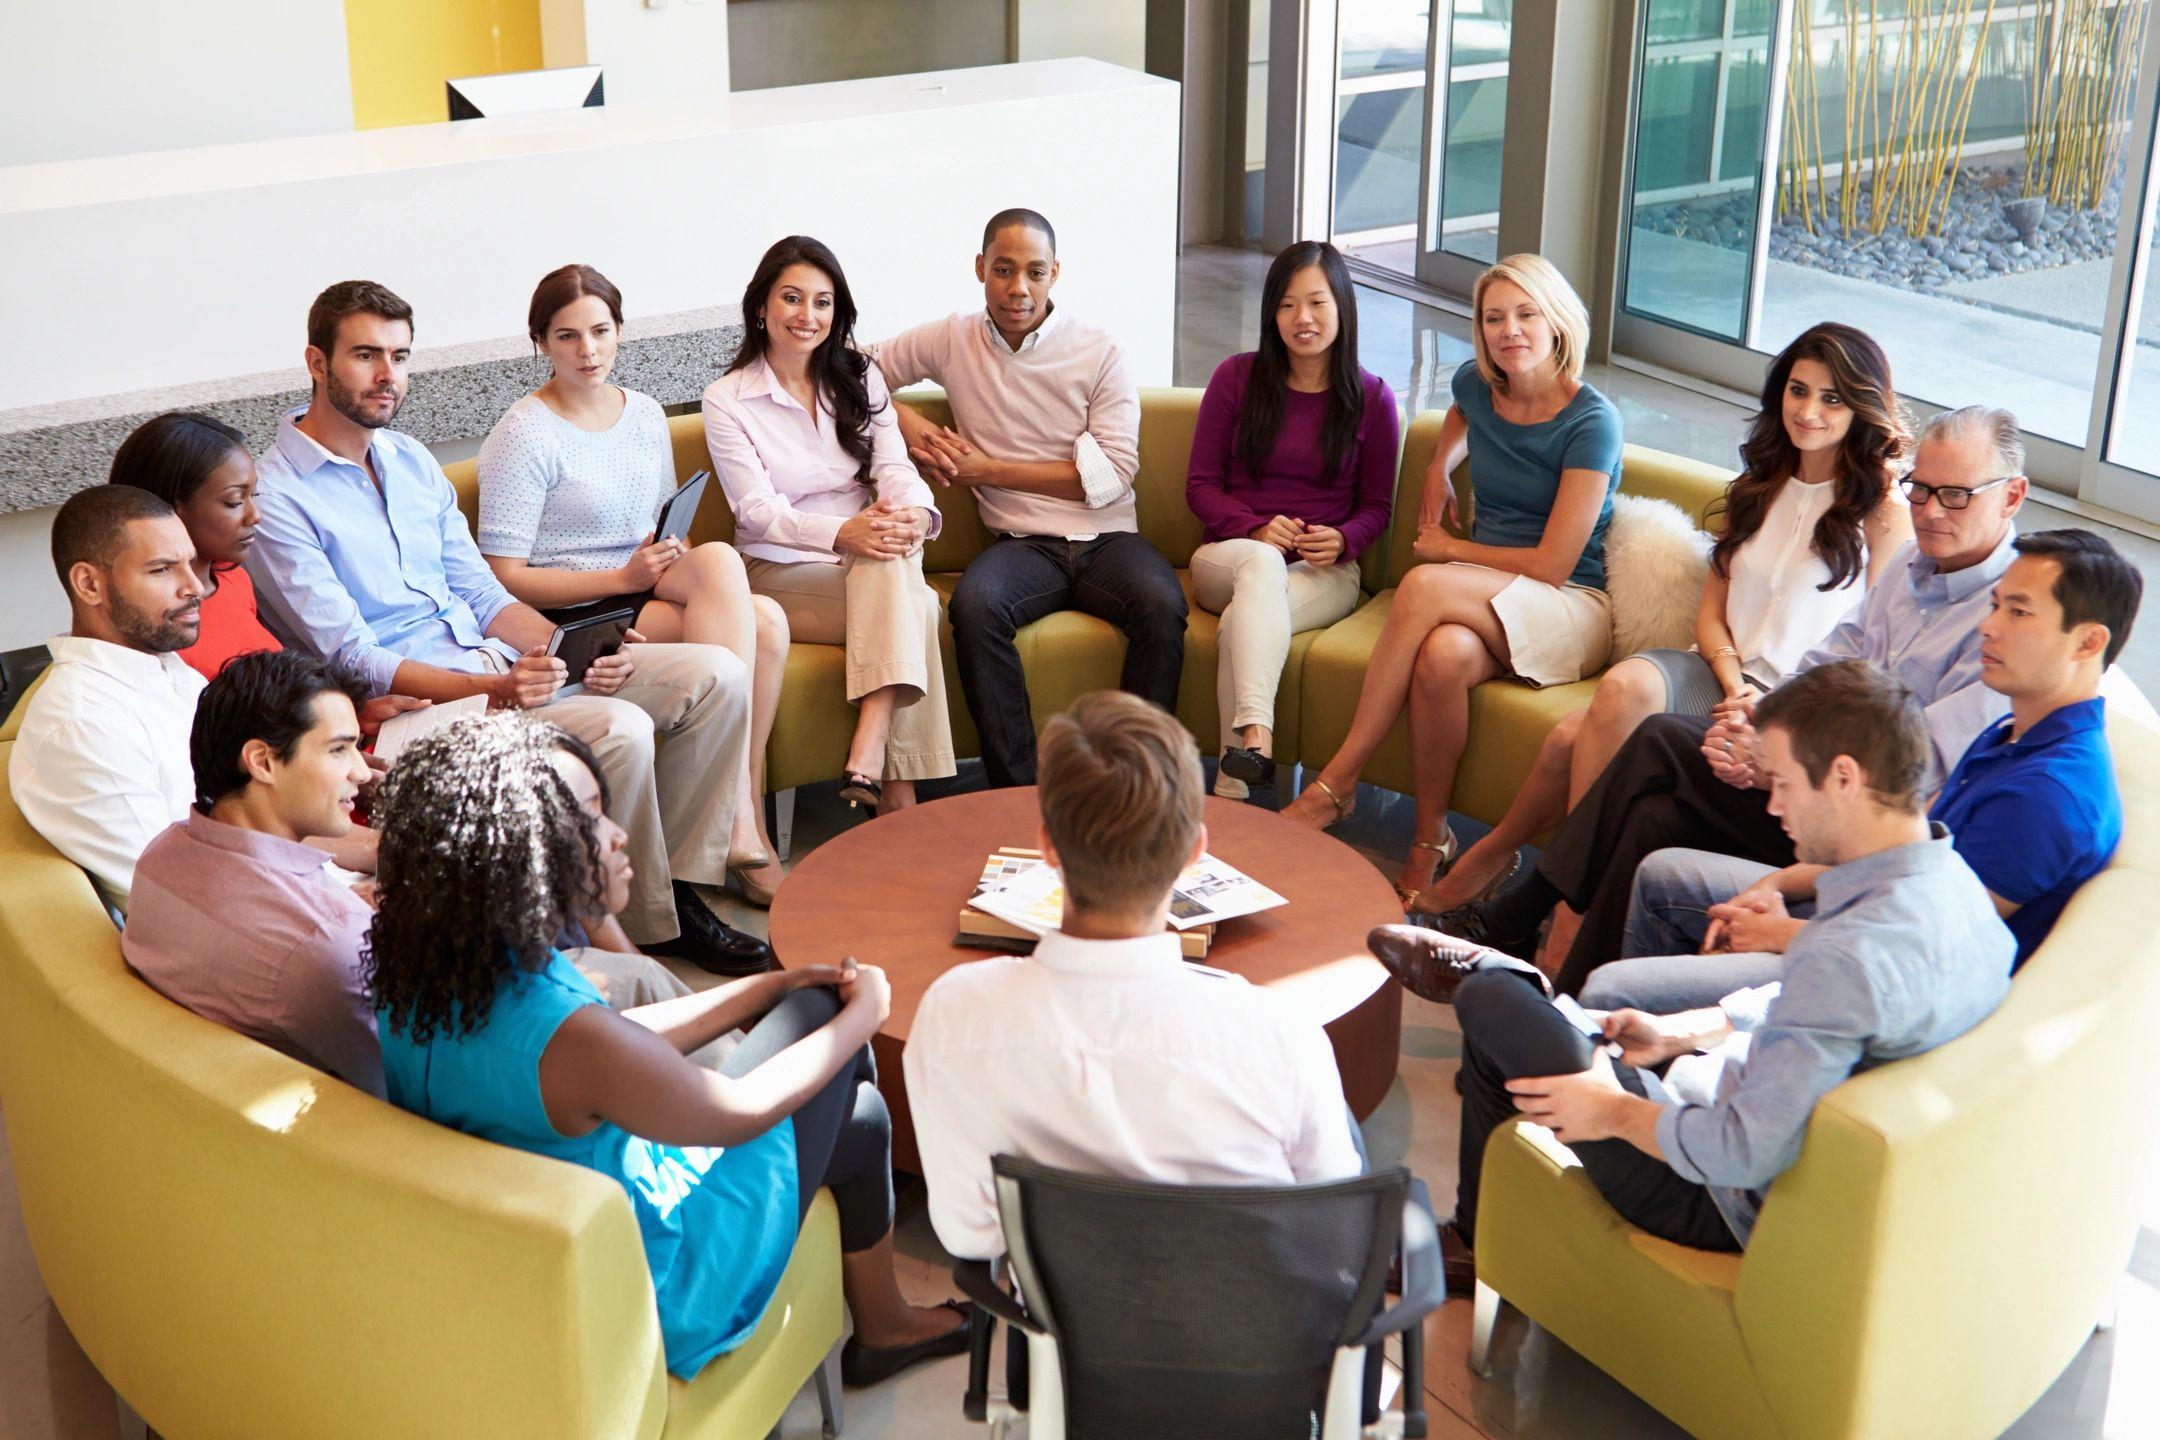 5 characteristics needed for teamwork